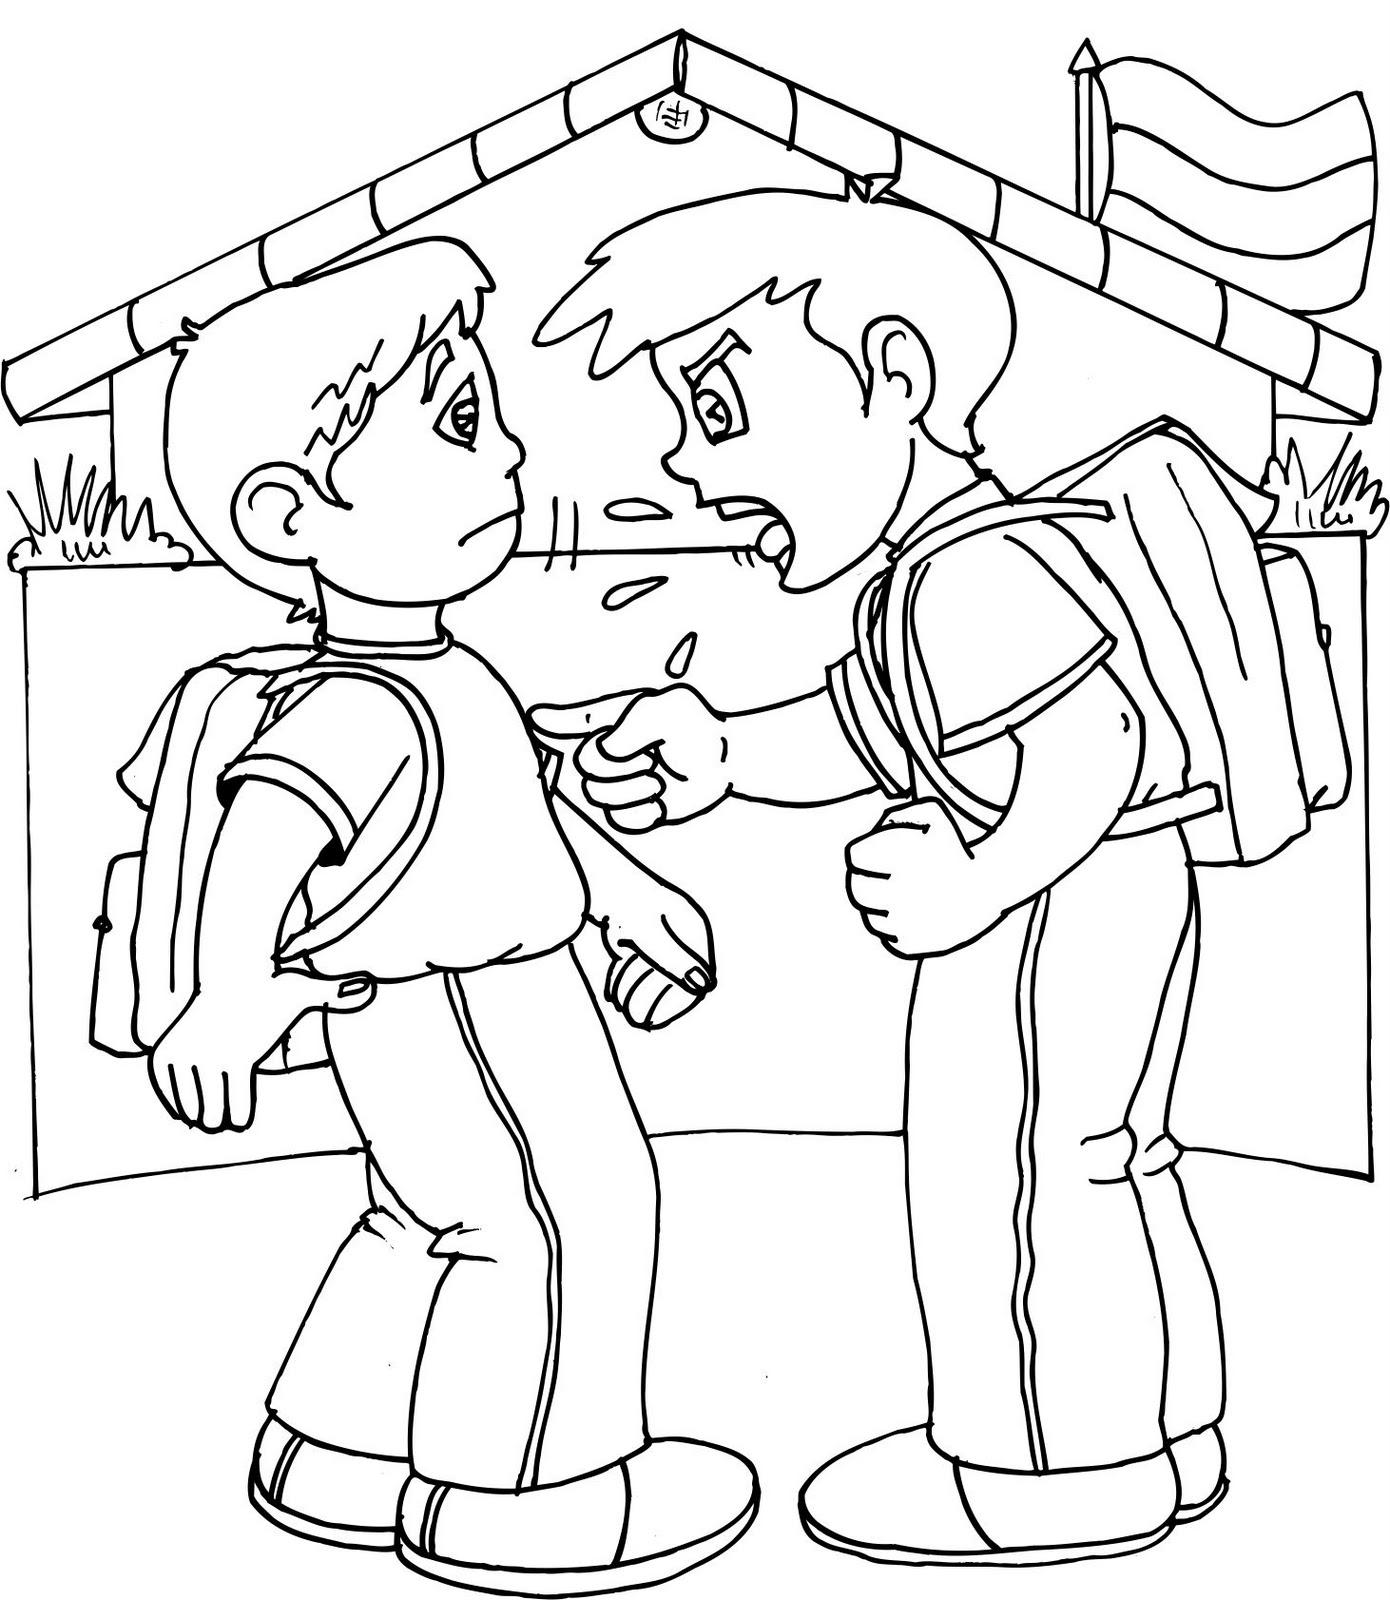 El Bullying Escolar En Dibujo